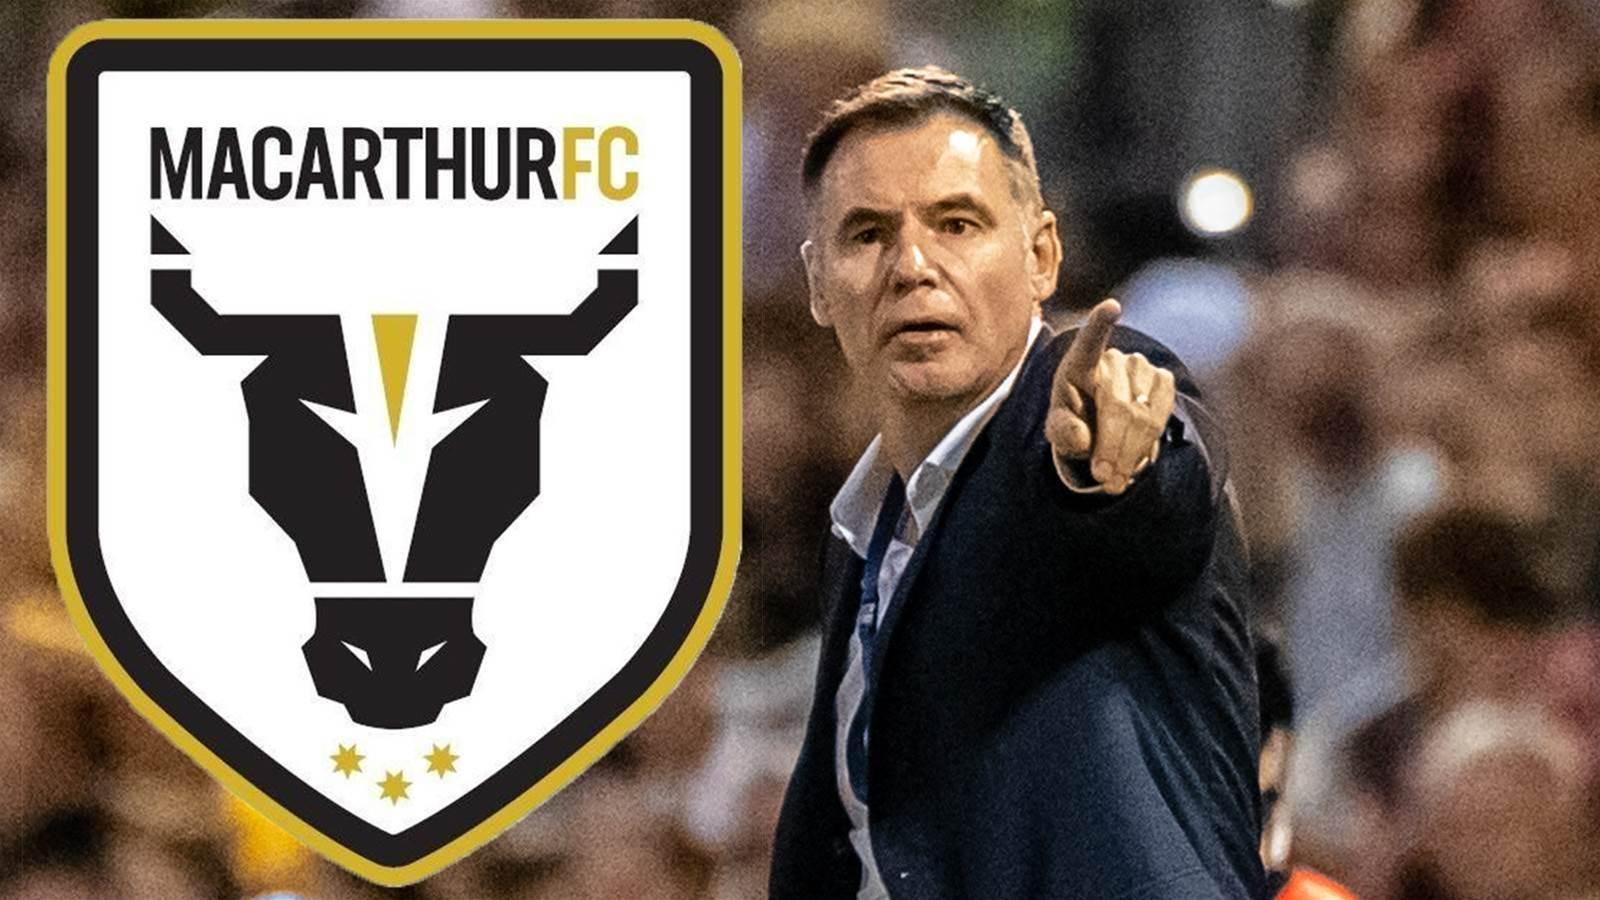 No Bull - Ante is Macarthur's new boss